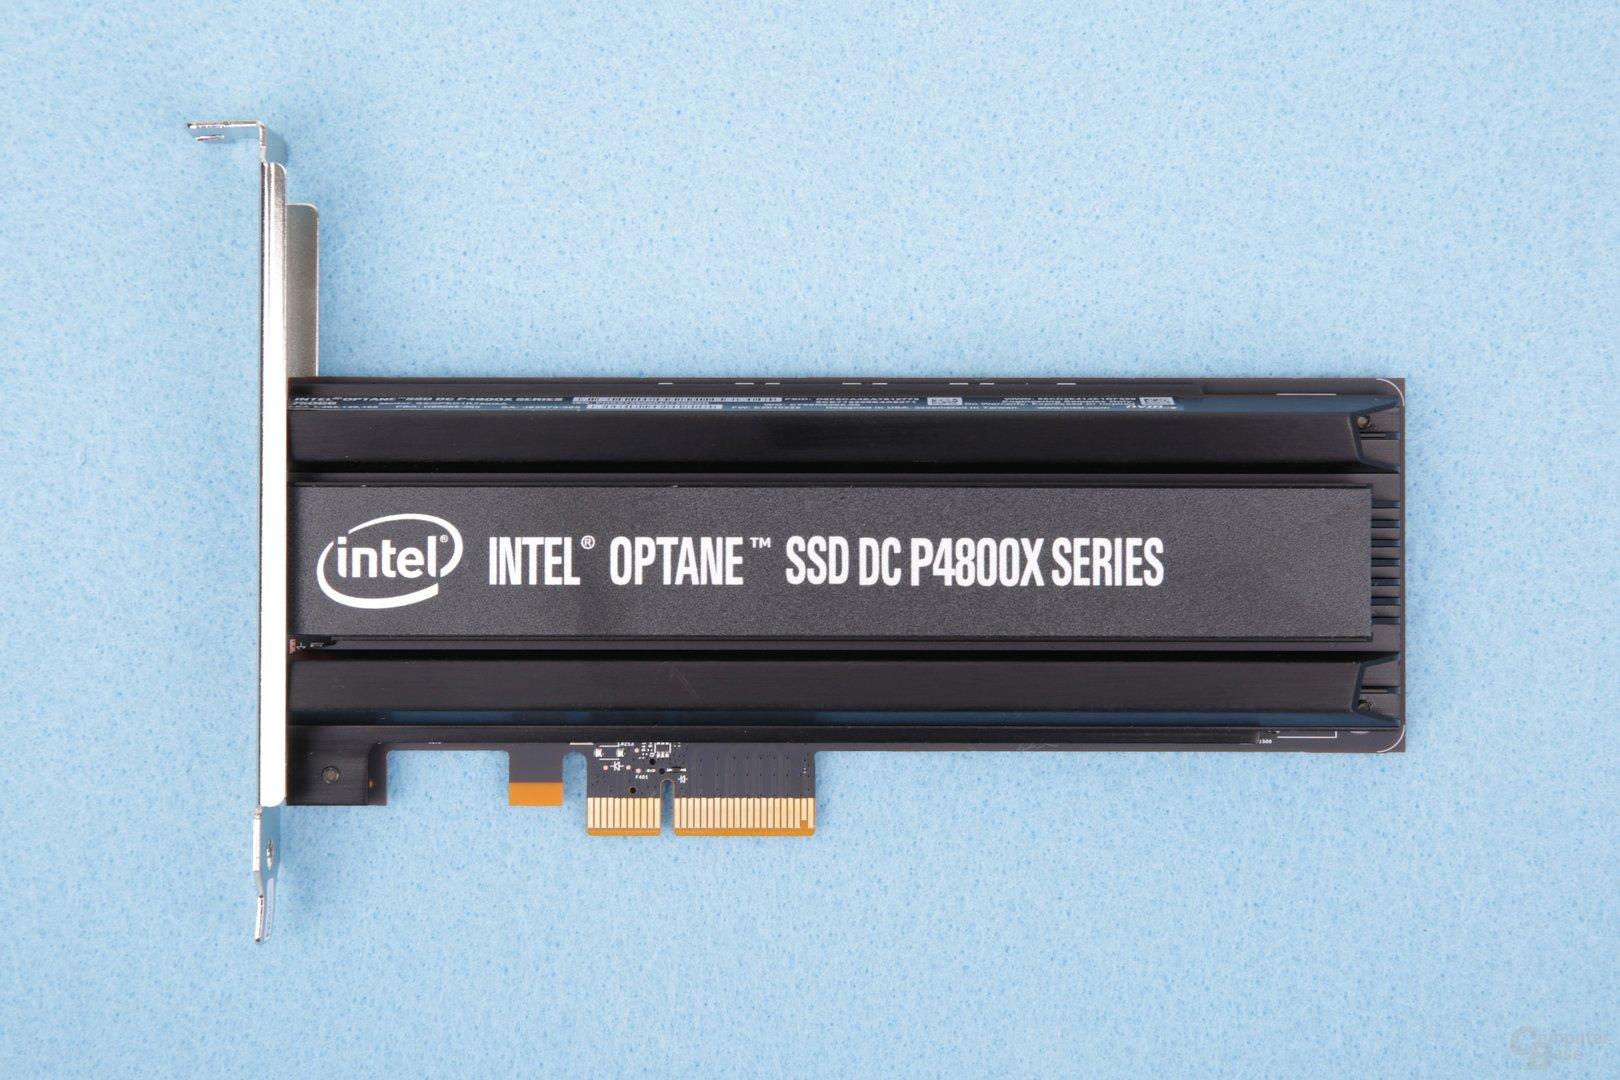 Die Intel Optane SSD DC P4800X im Test